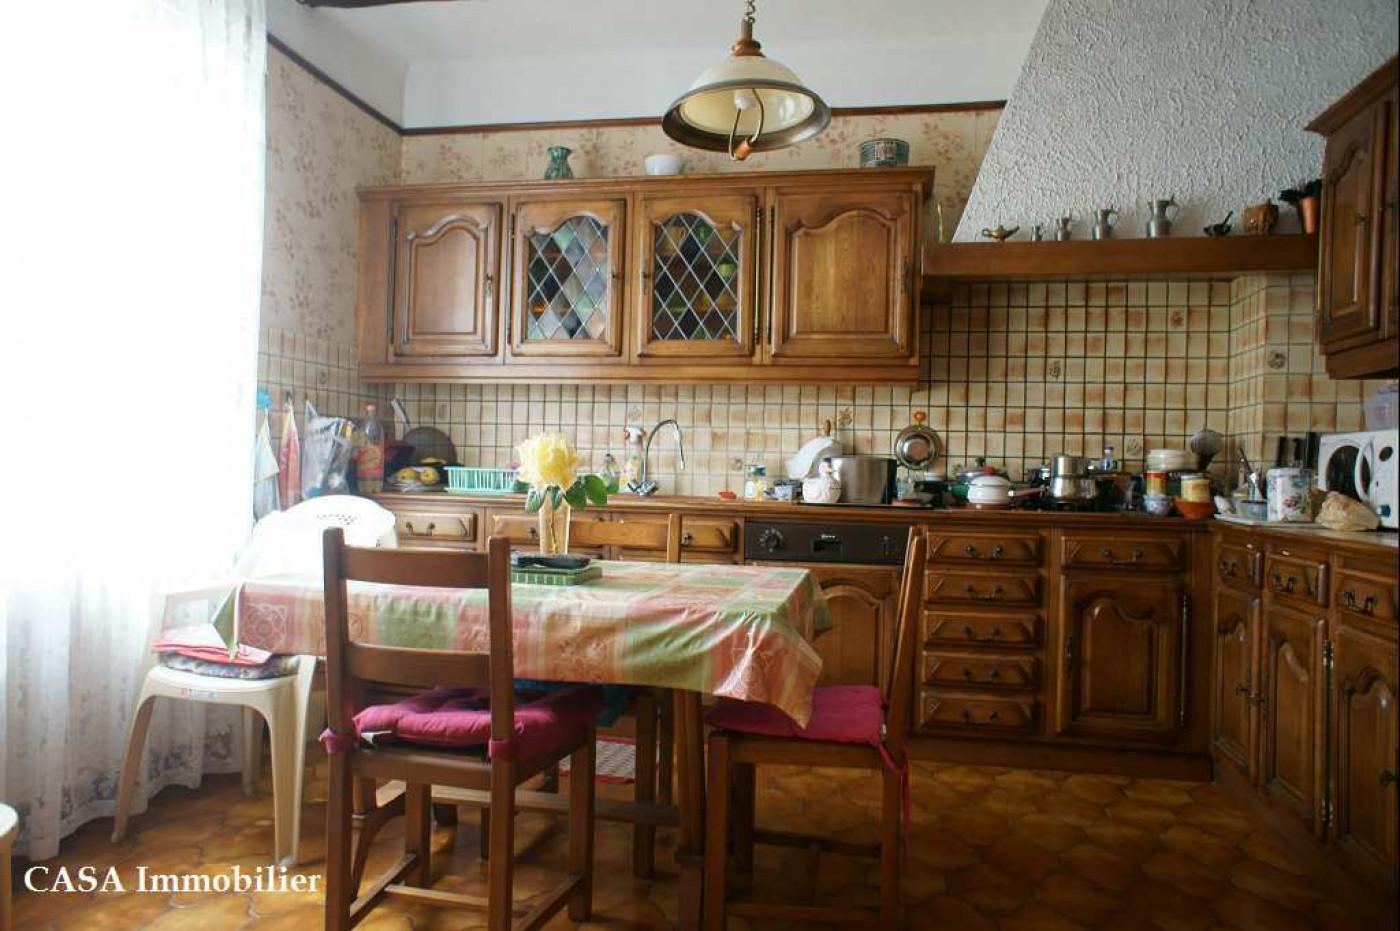 A vendre Drancy 93001163 Casa immobilier